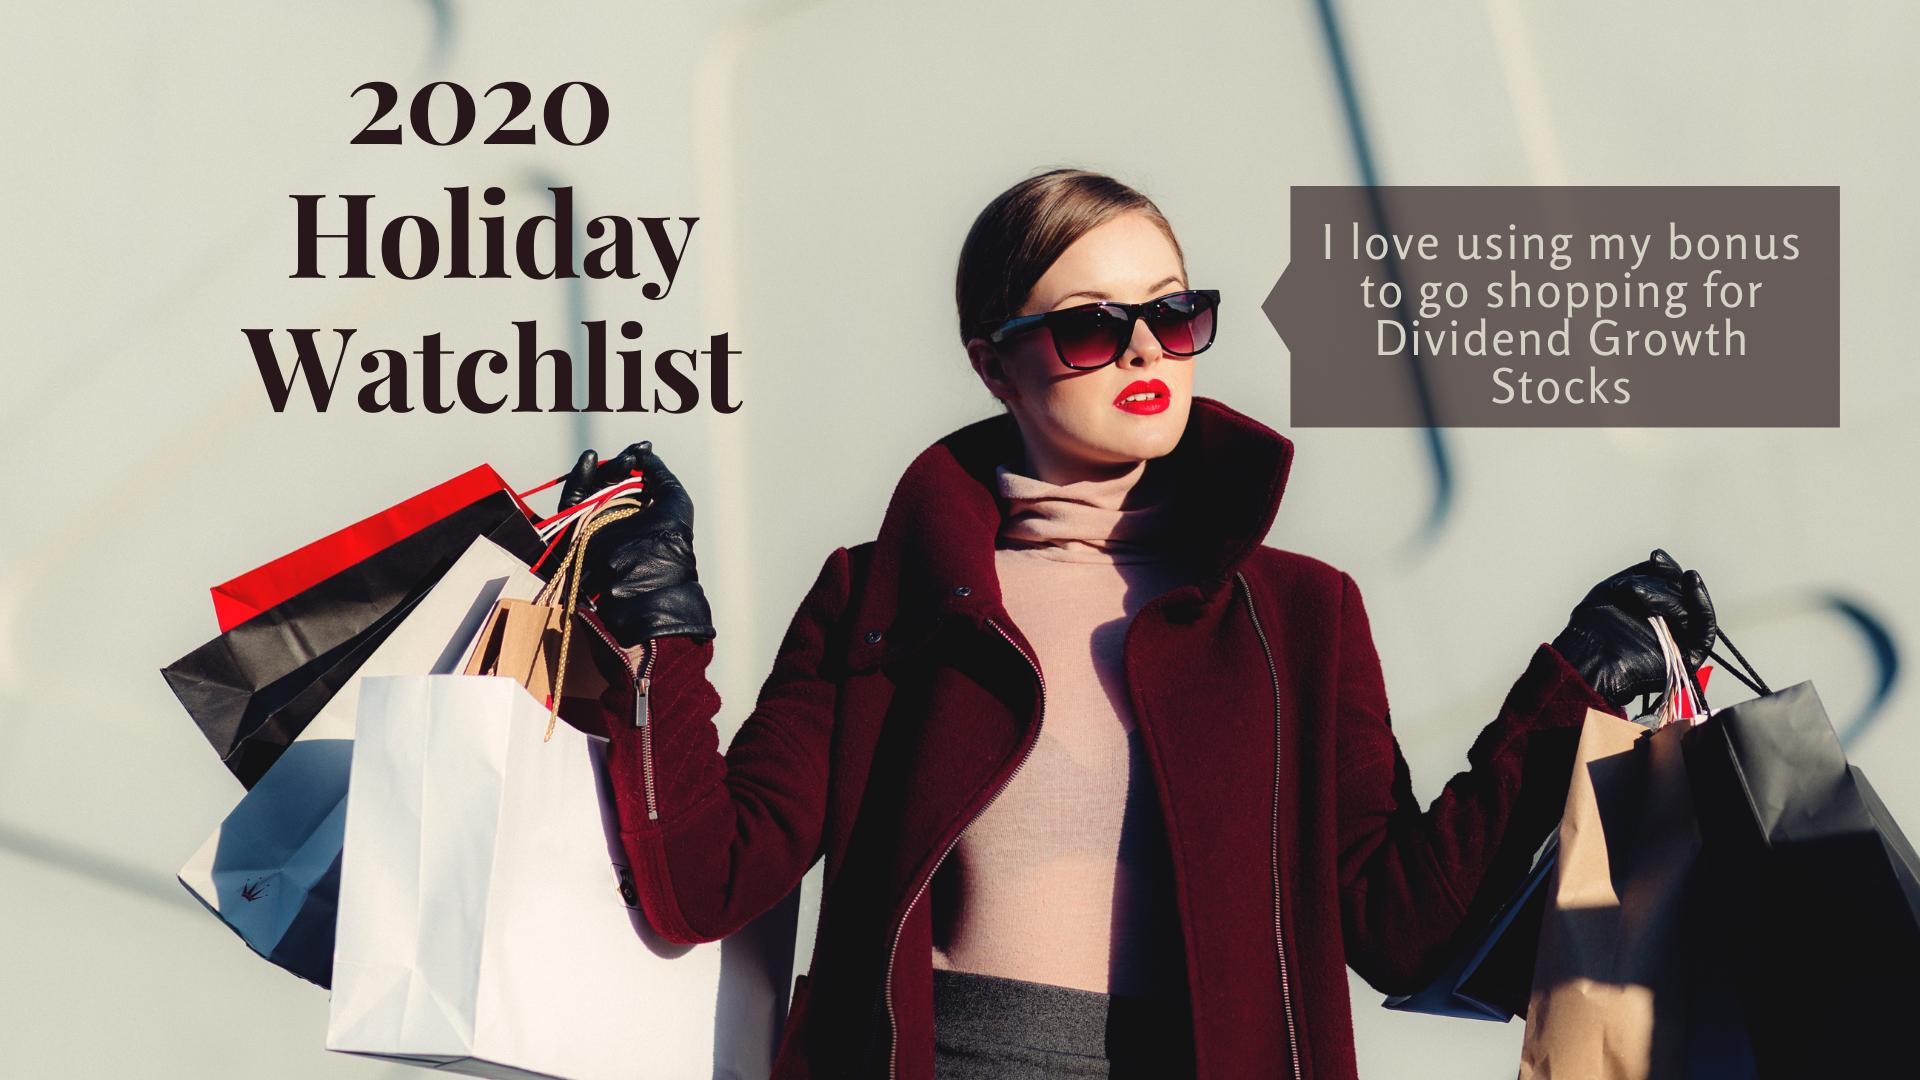 2020 Holiday Watchlist